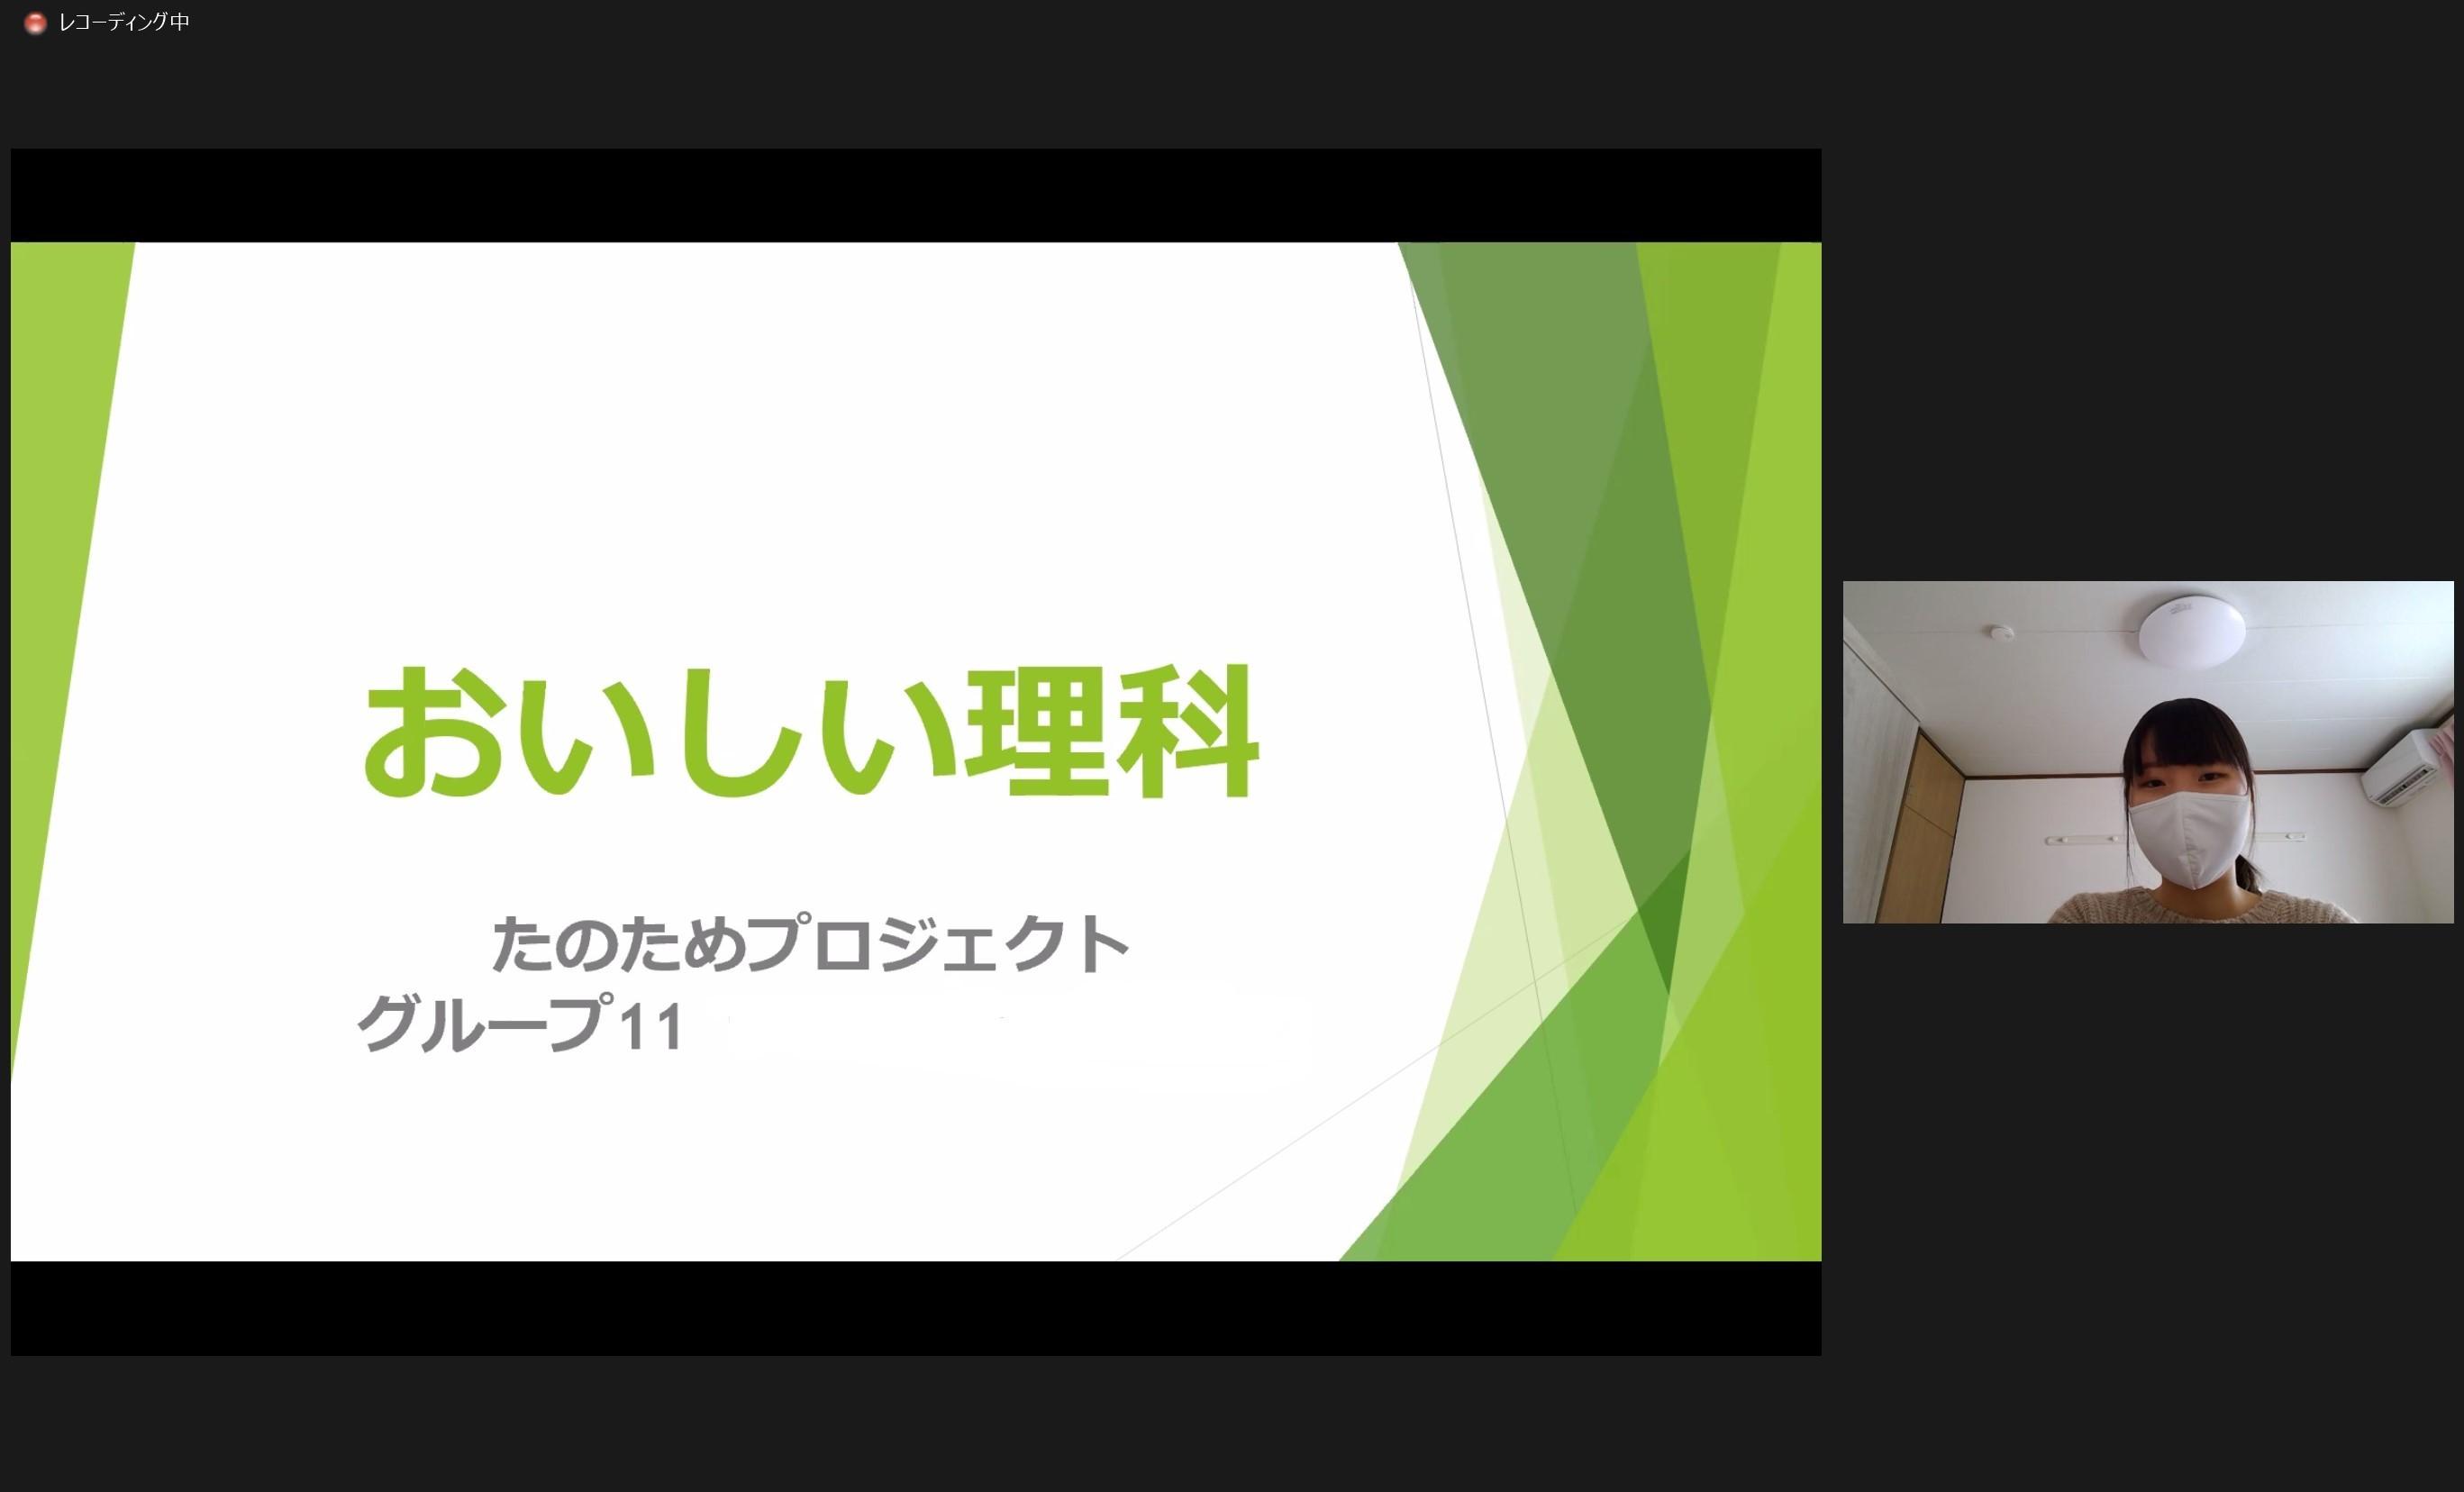 Inkedスクリーンショット (21)_LI.jpg